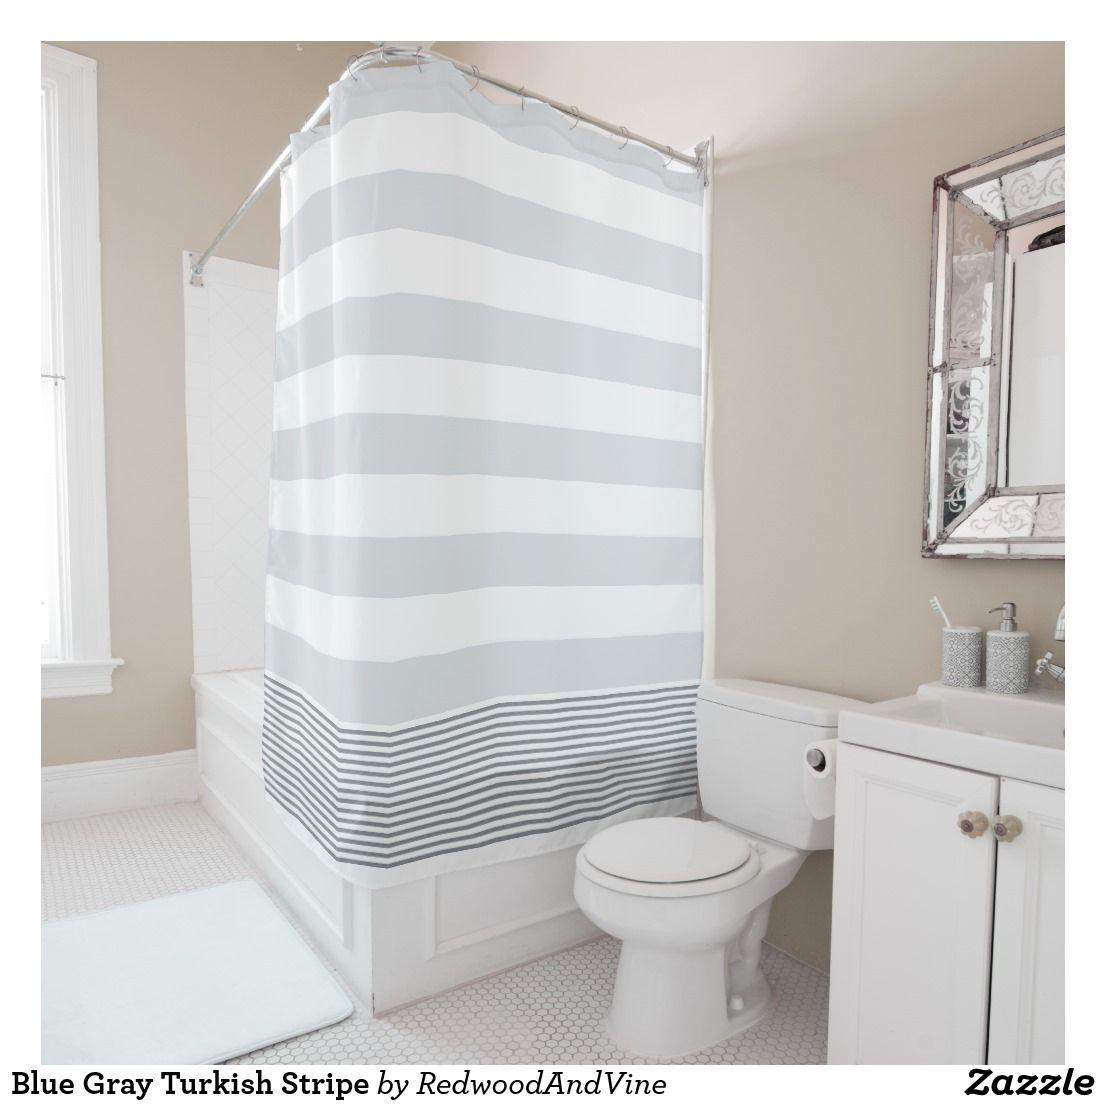 Blue Gray Turkish Stripe Shower Curtain Zazzle Com Striped Shower Curtains Patterned Shower Curtain Curtains To Match Grey Walls